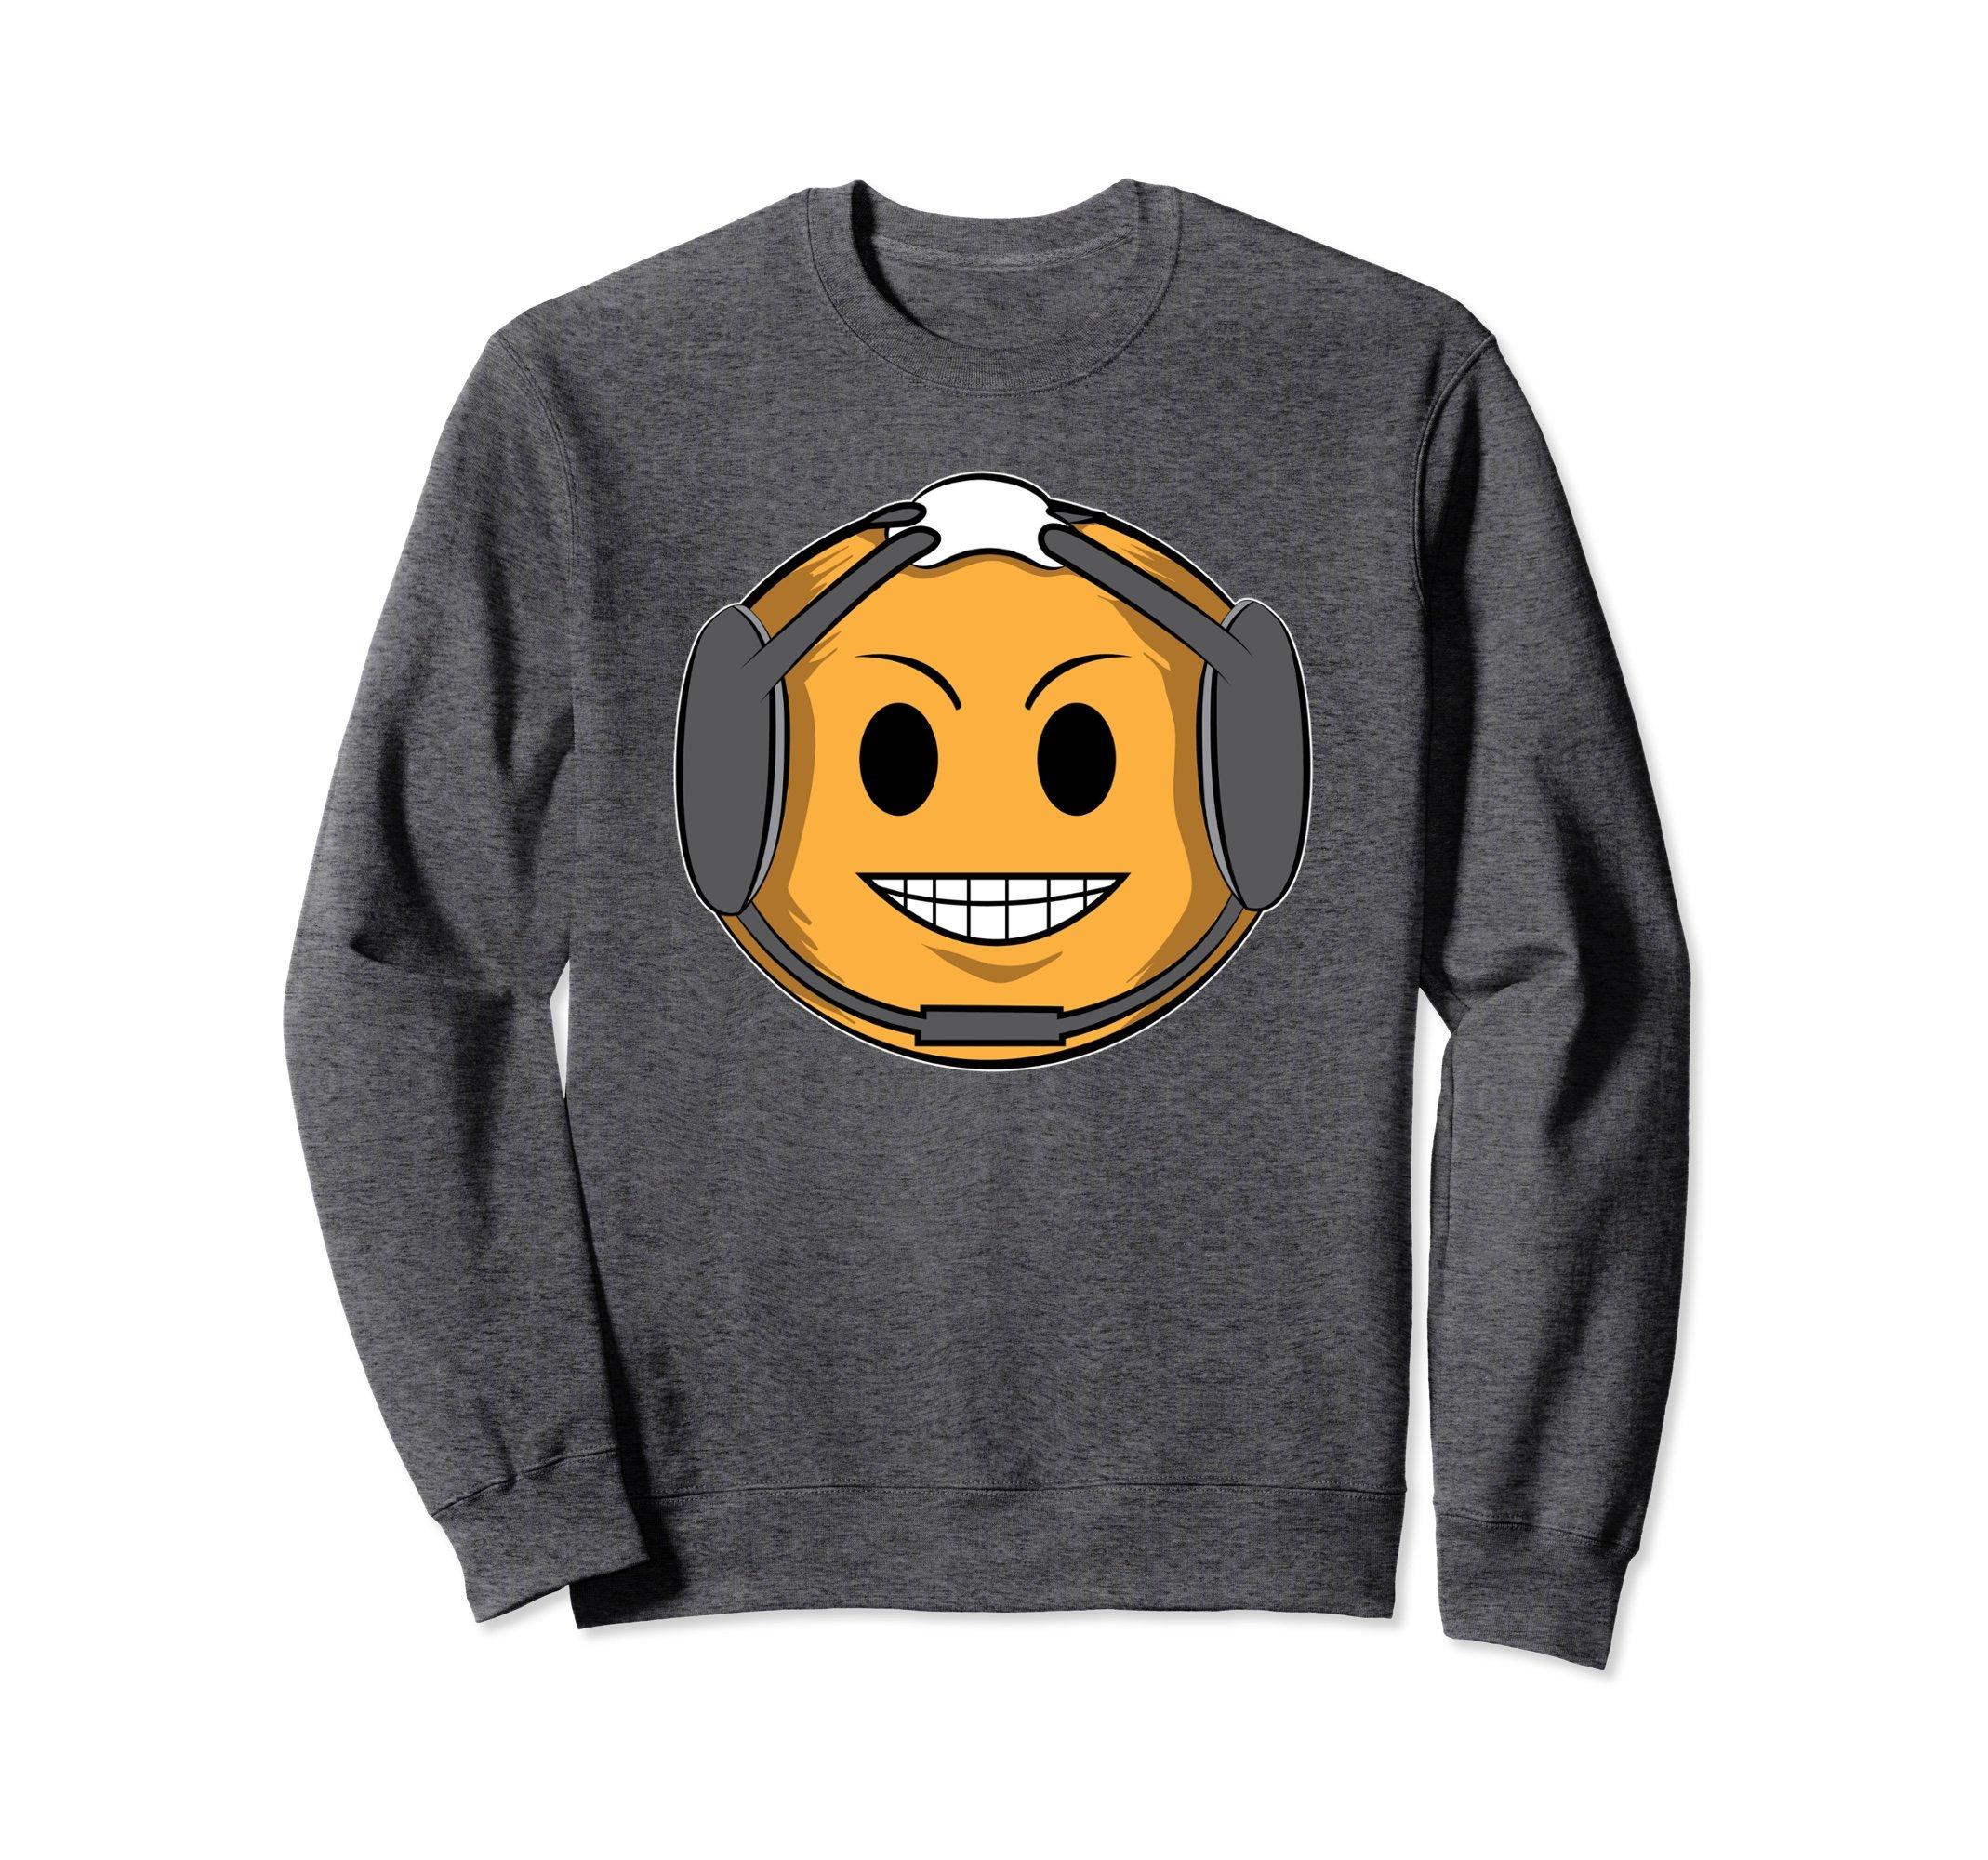 Unisex Wrestling Sweatshirt - Emoji Sweater - Wrestling Headgear Large Dark Heather